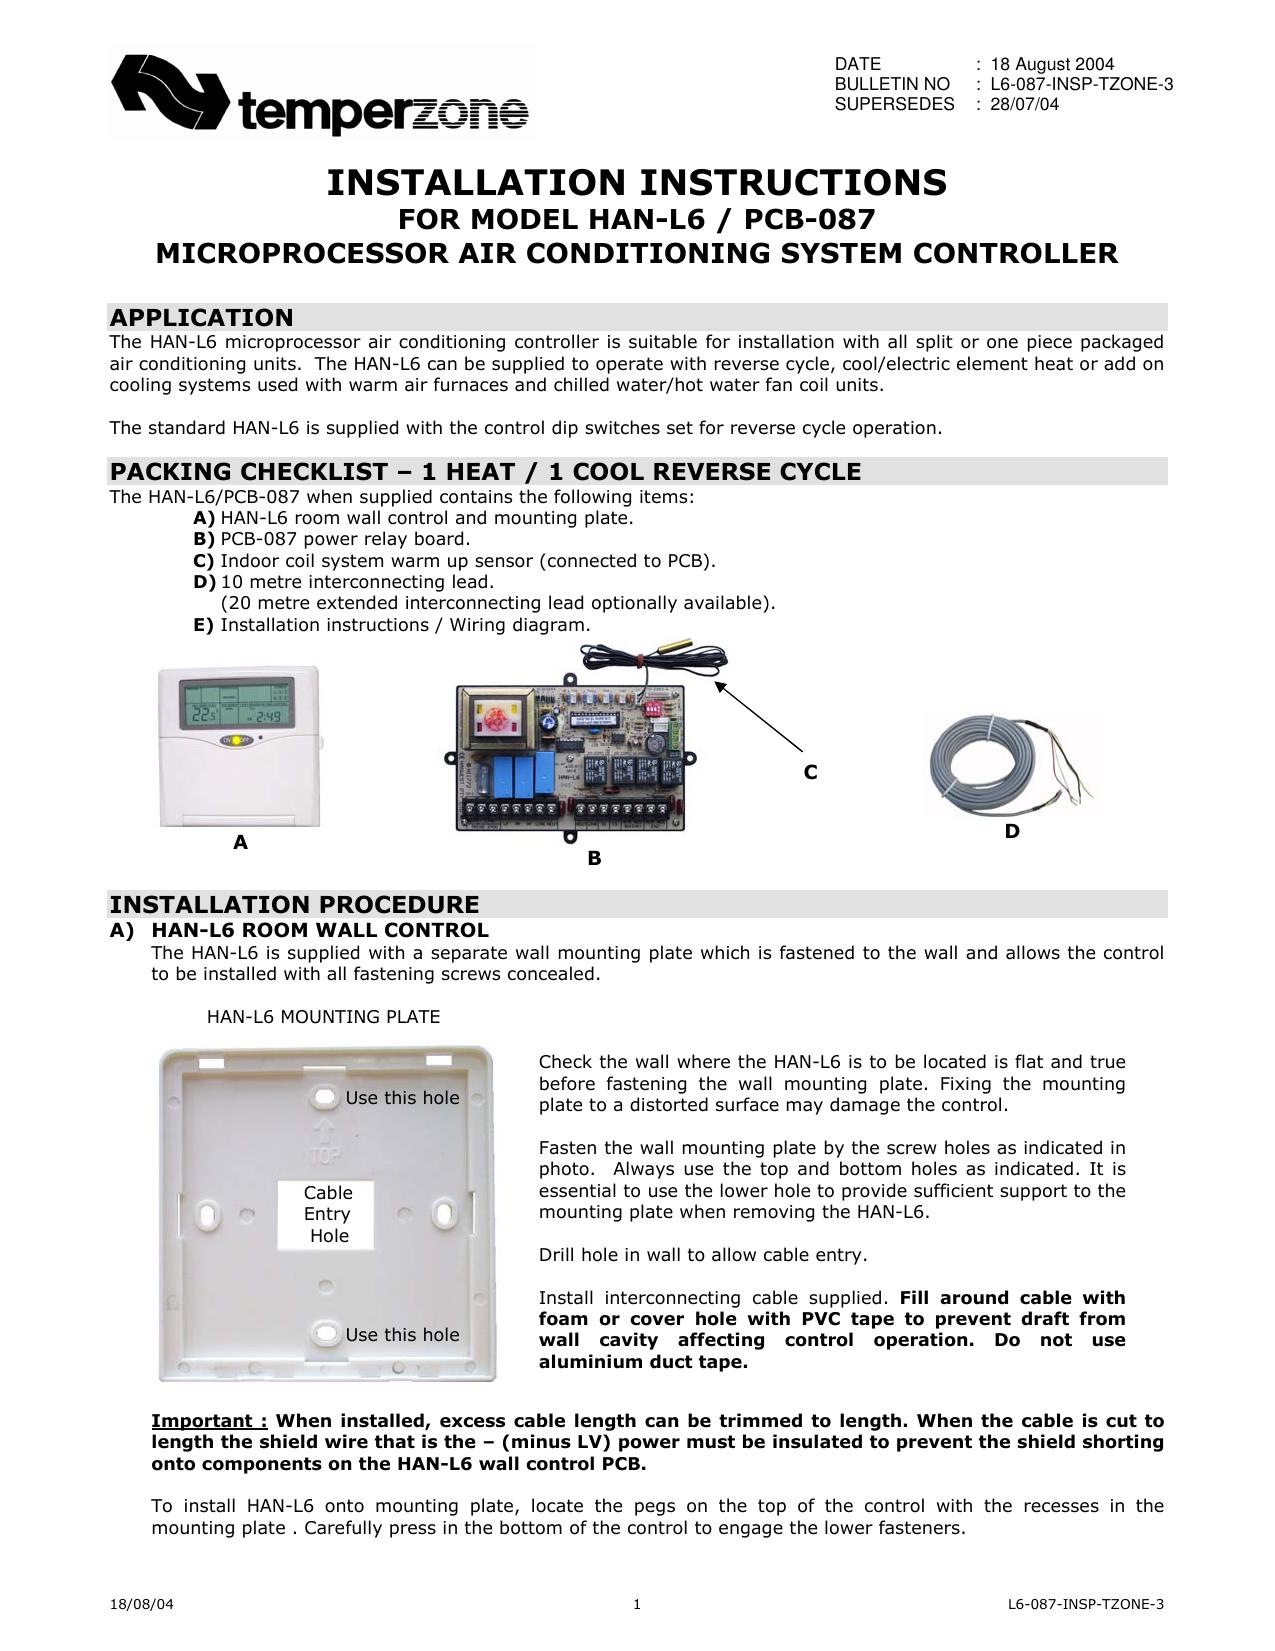 installation instructions   Manualzz